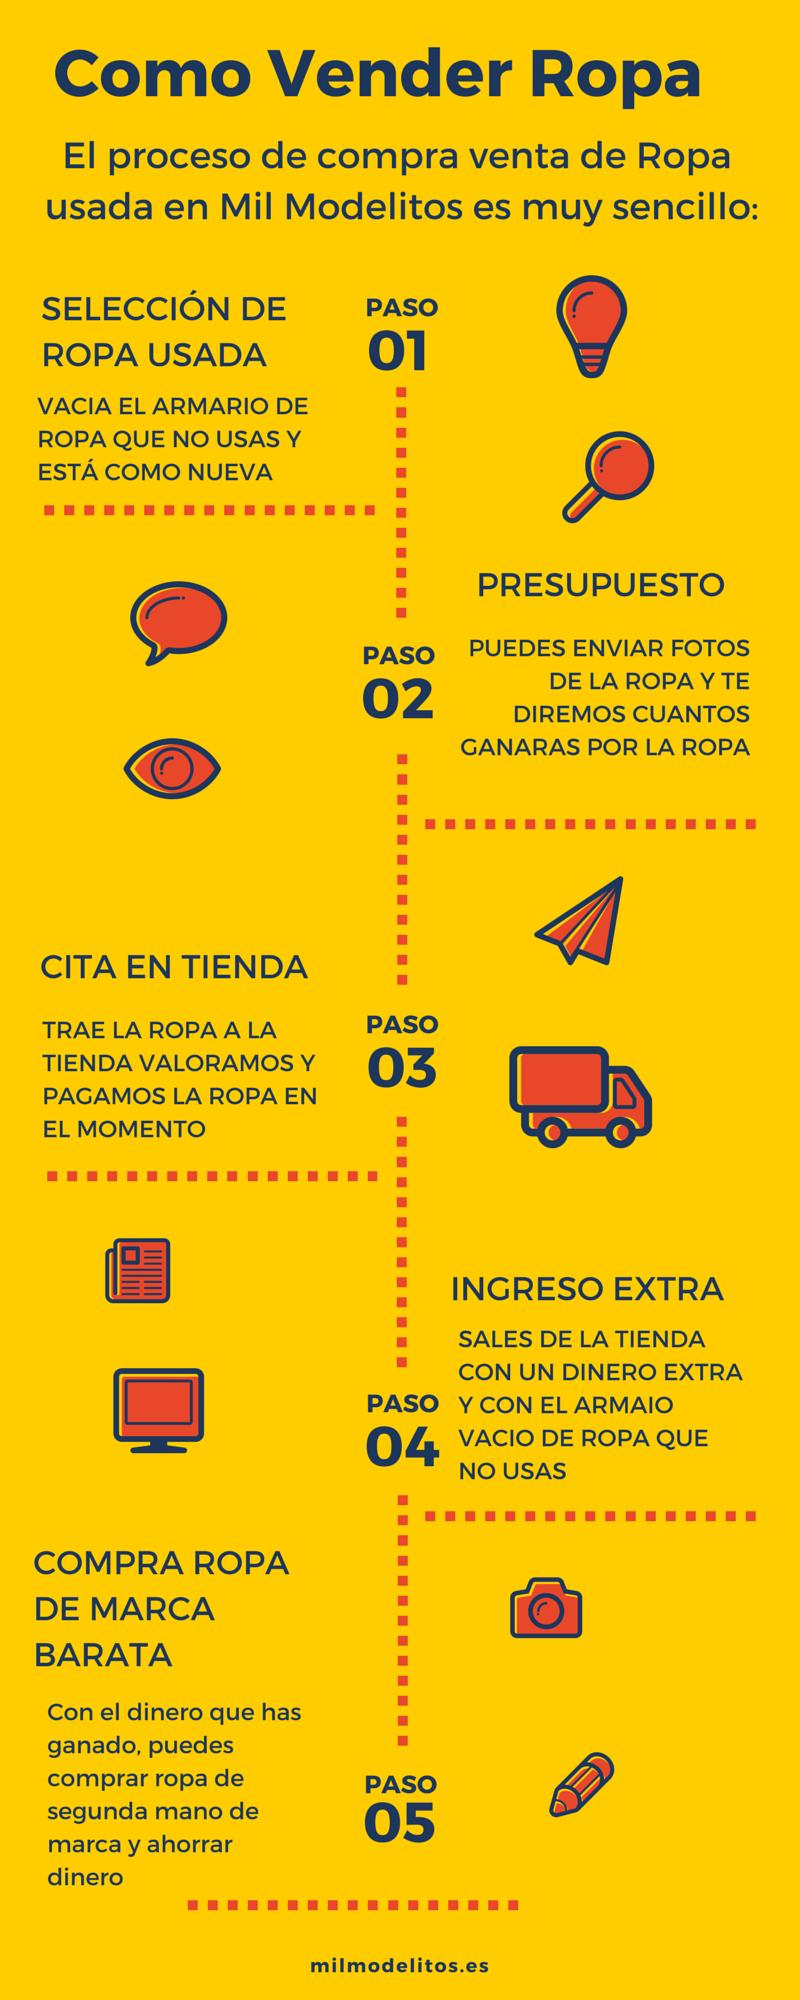 9b2eb394fa Como vender ropa usada-Infografía - Mil Modelitos Compra Venta Ropa de  segunda mano de marca